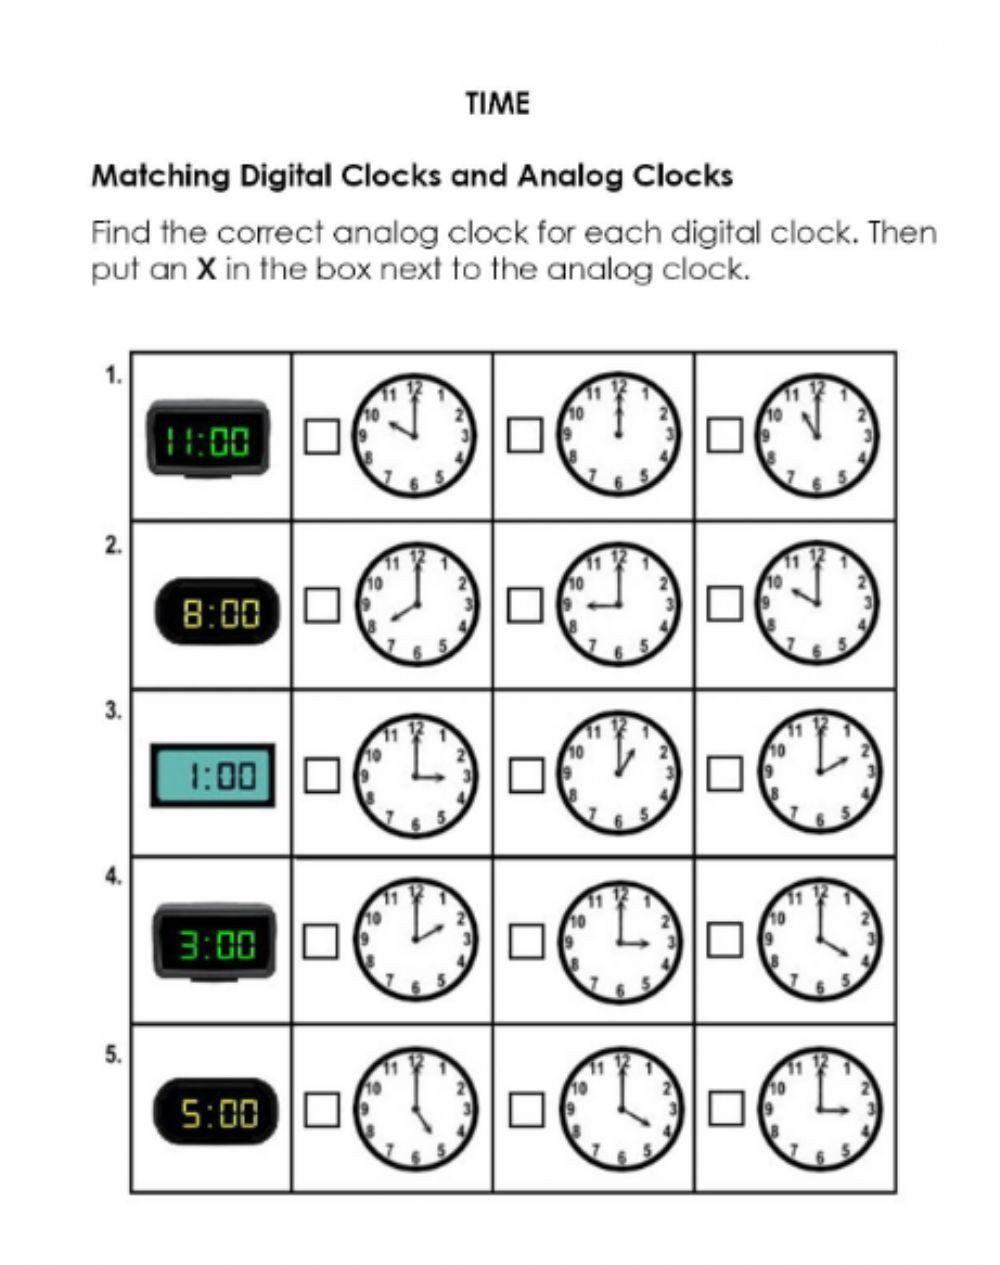 hight resolution of Analogue and Digital Clock Worksheets Match Digital and Analog Clocks  Interactive Worksheet   Clock worksheets